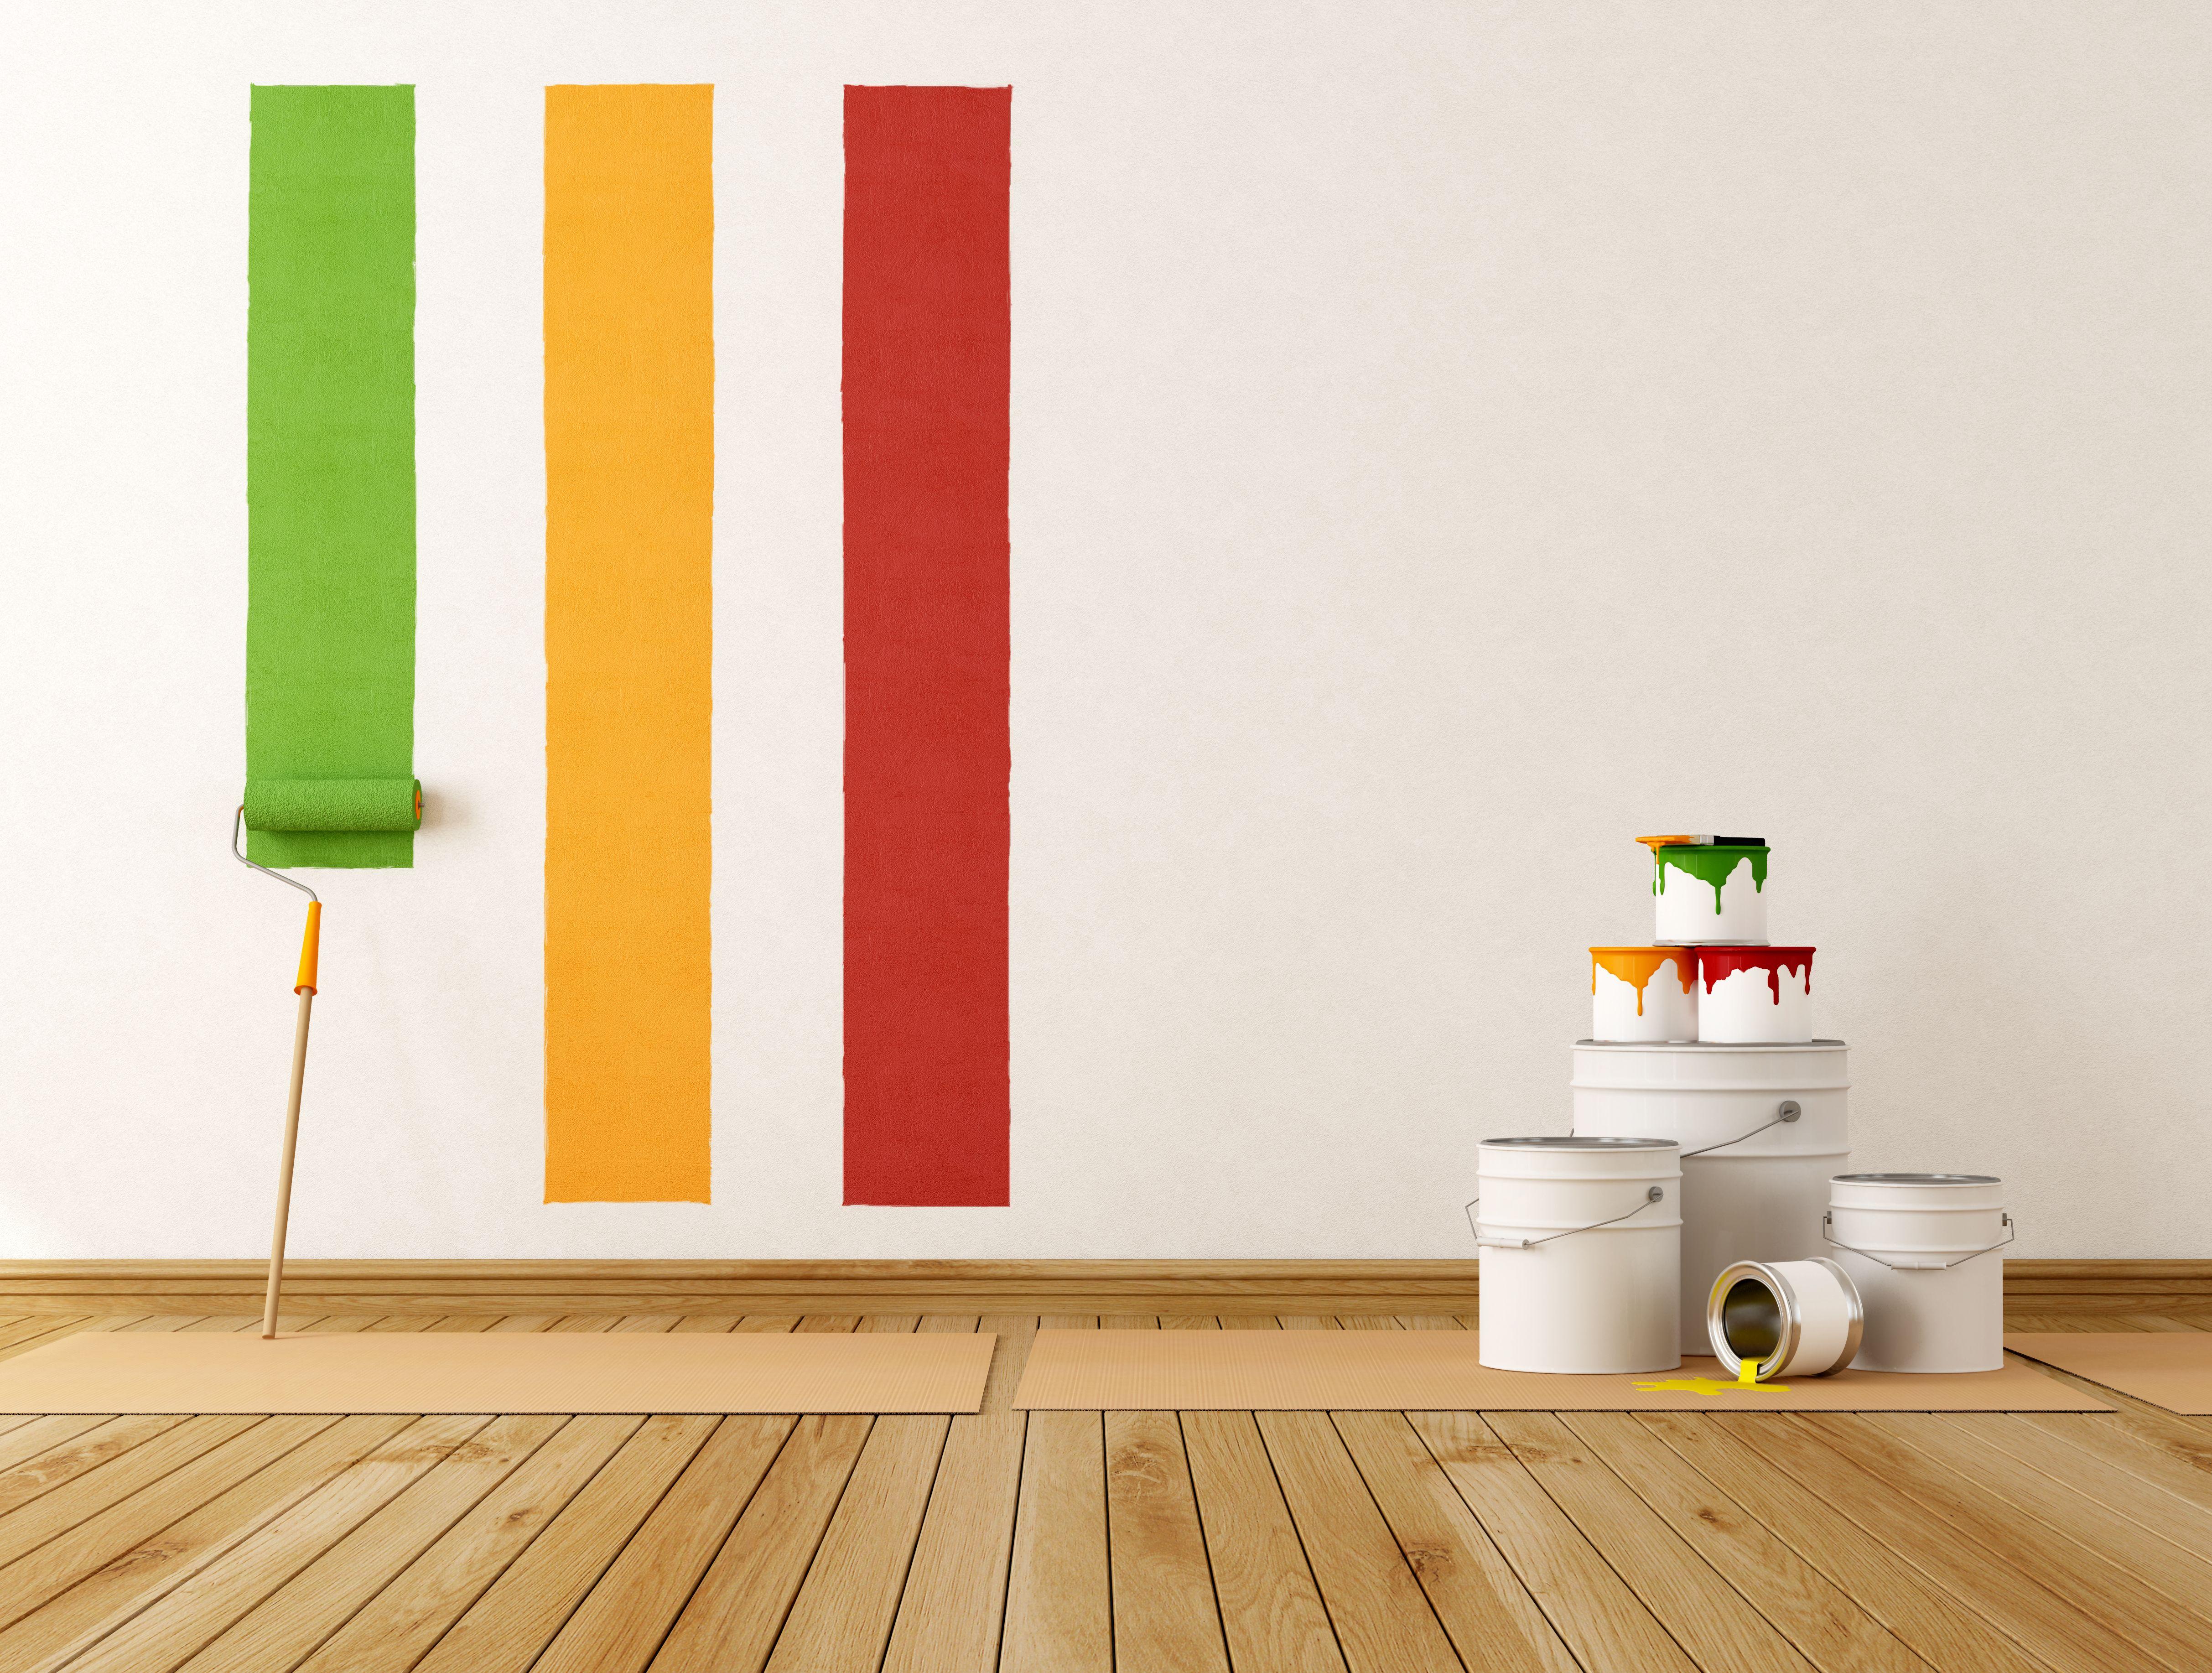 Encuentra la pintura perfecta para cada estancia de tu hogar en Borriolq